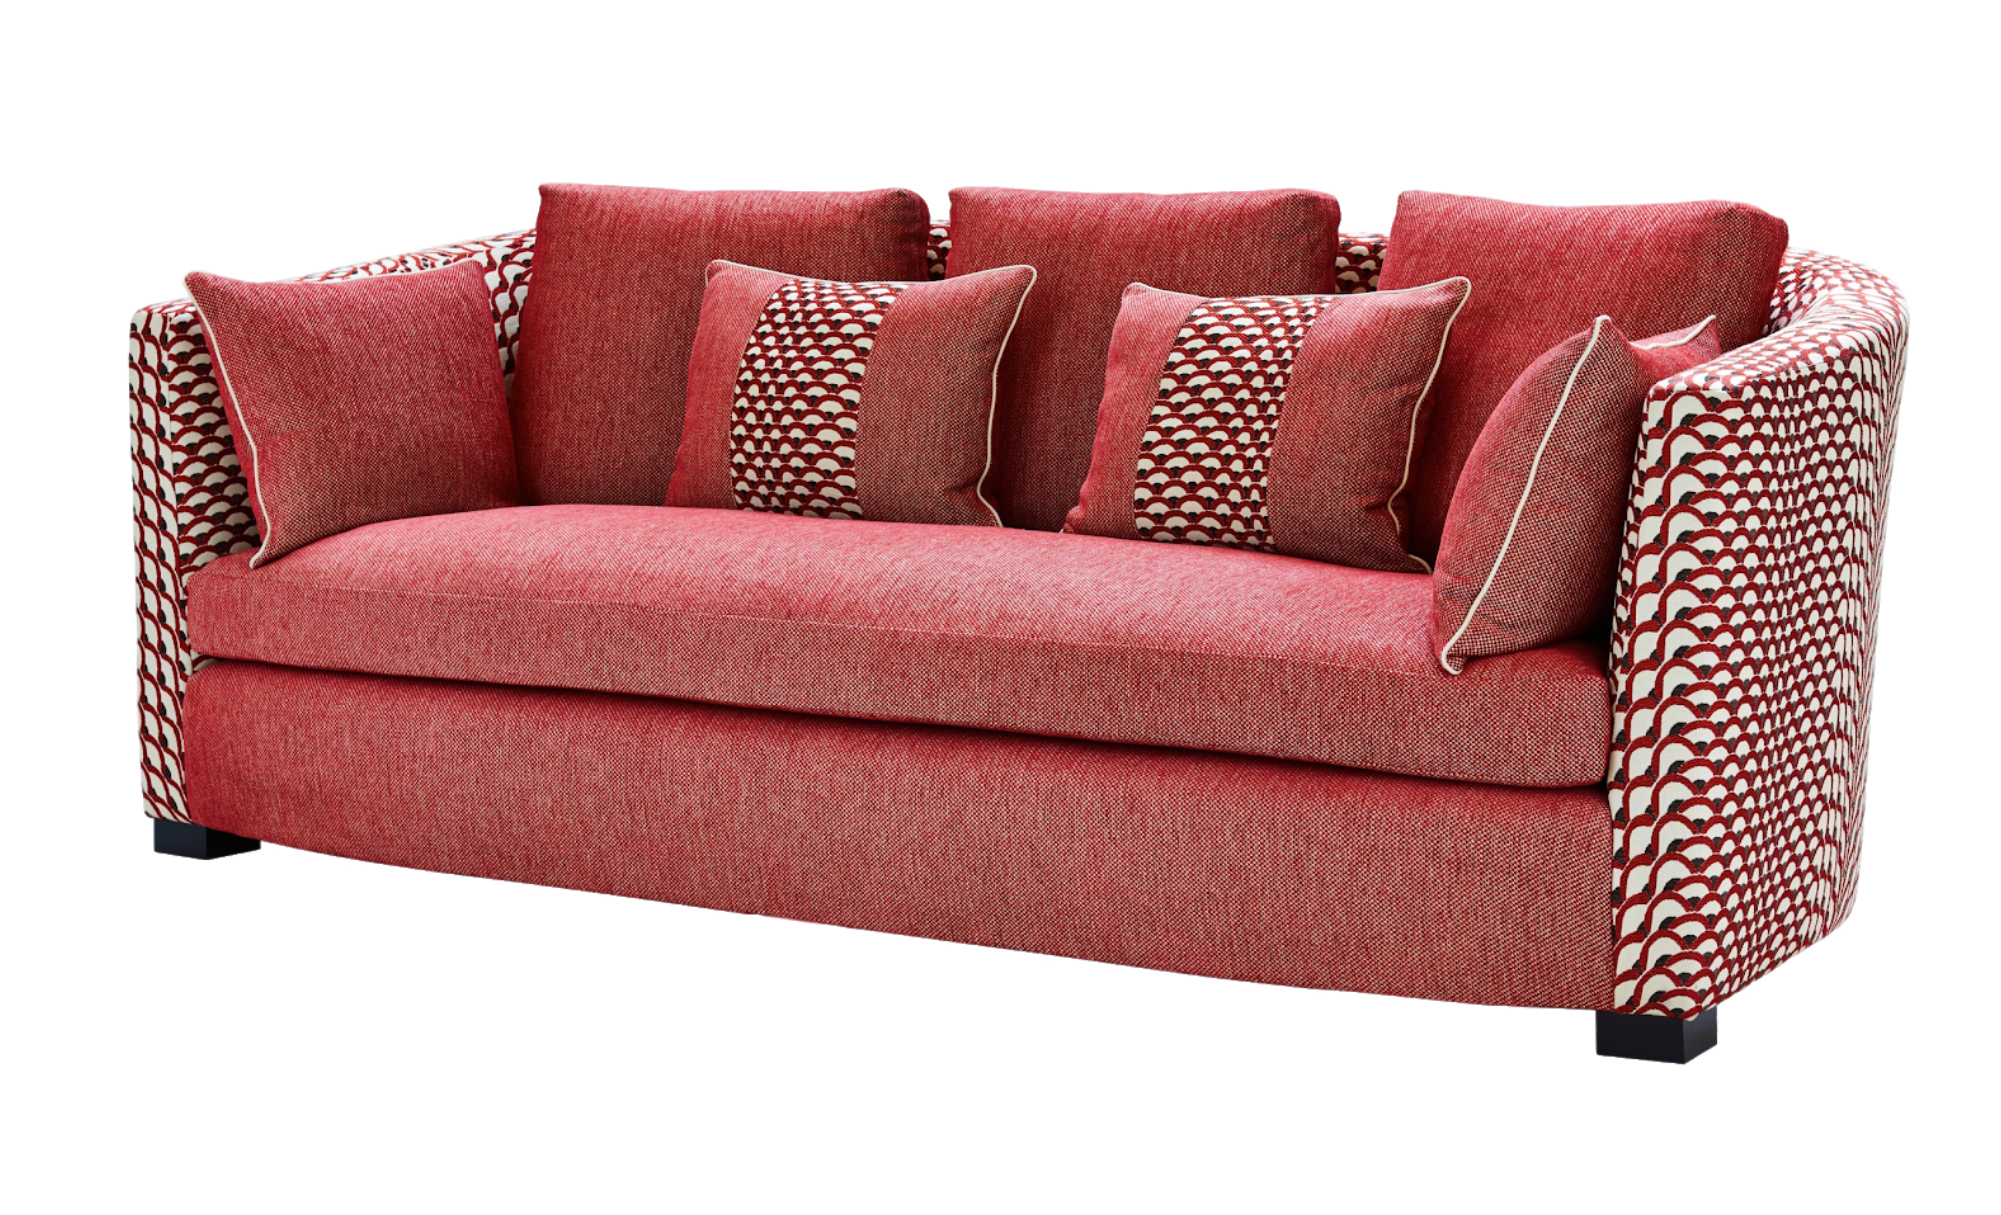 sofa-fabric.jpg